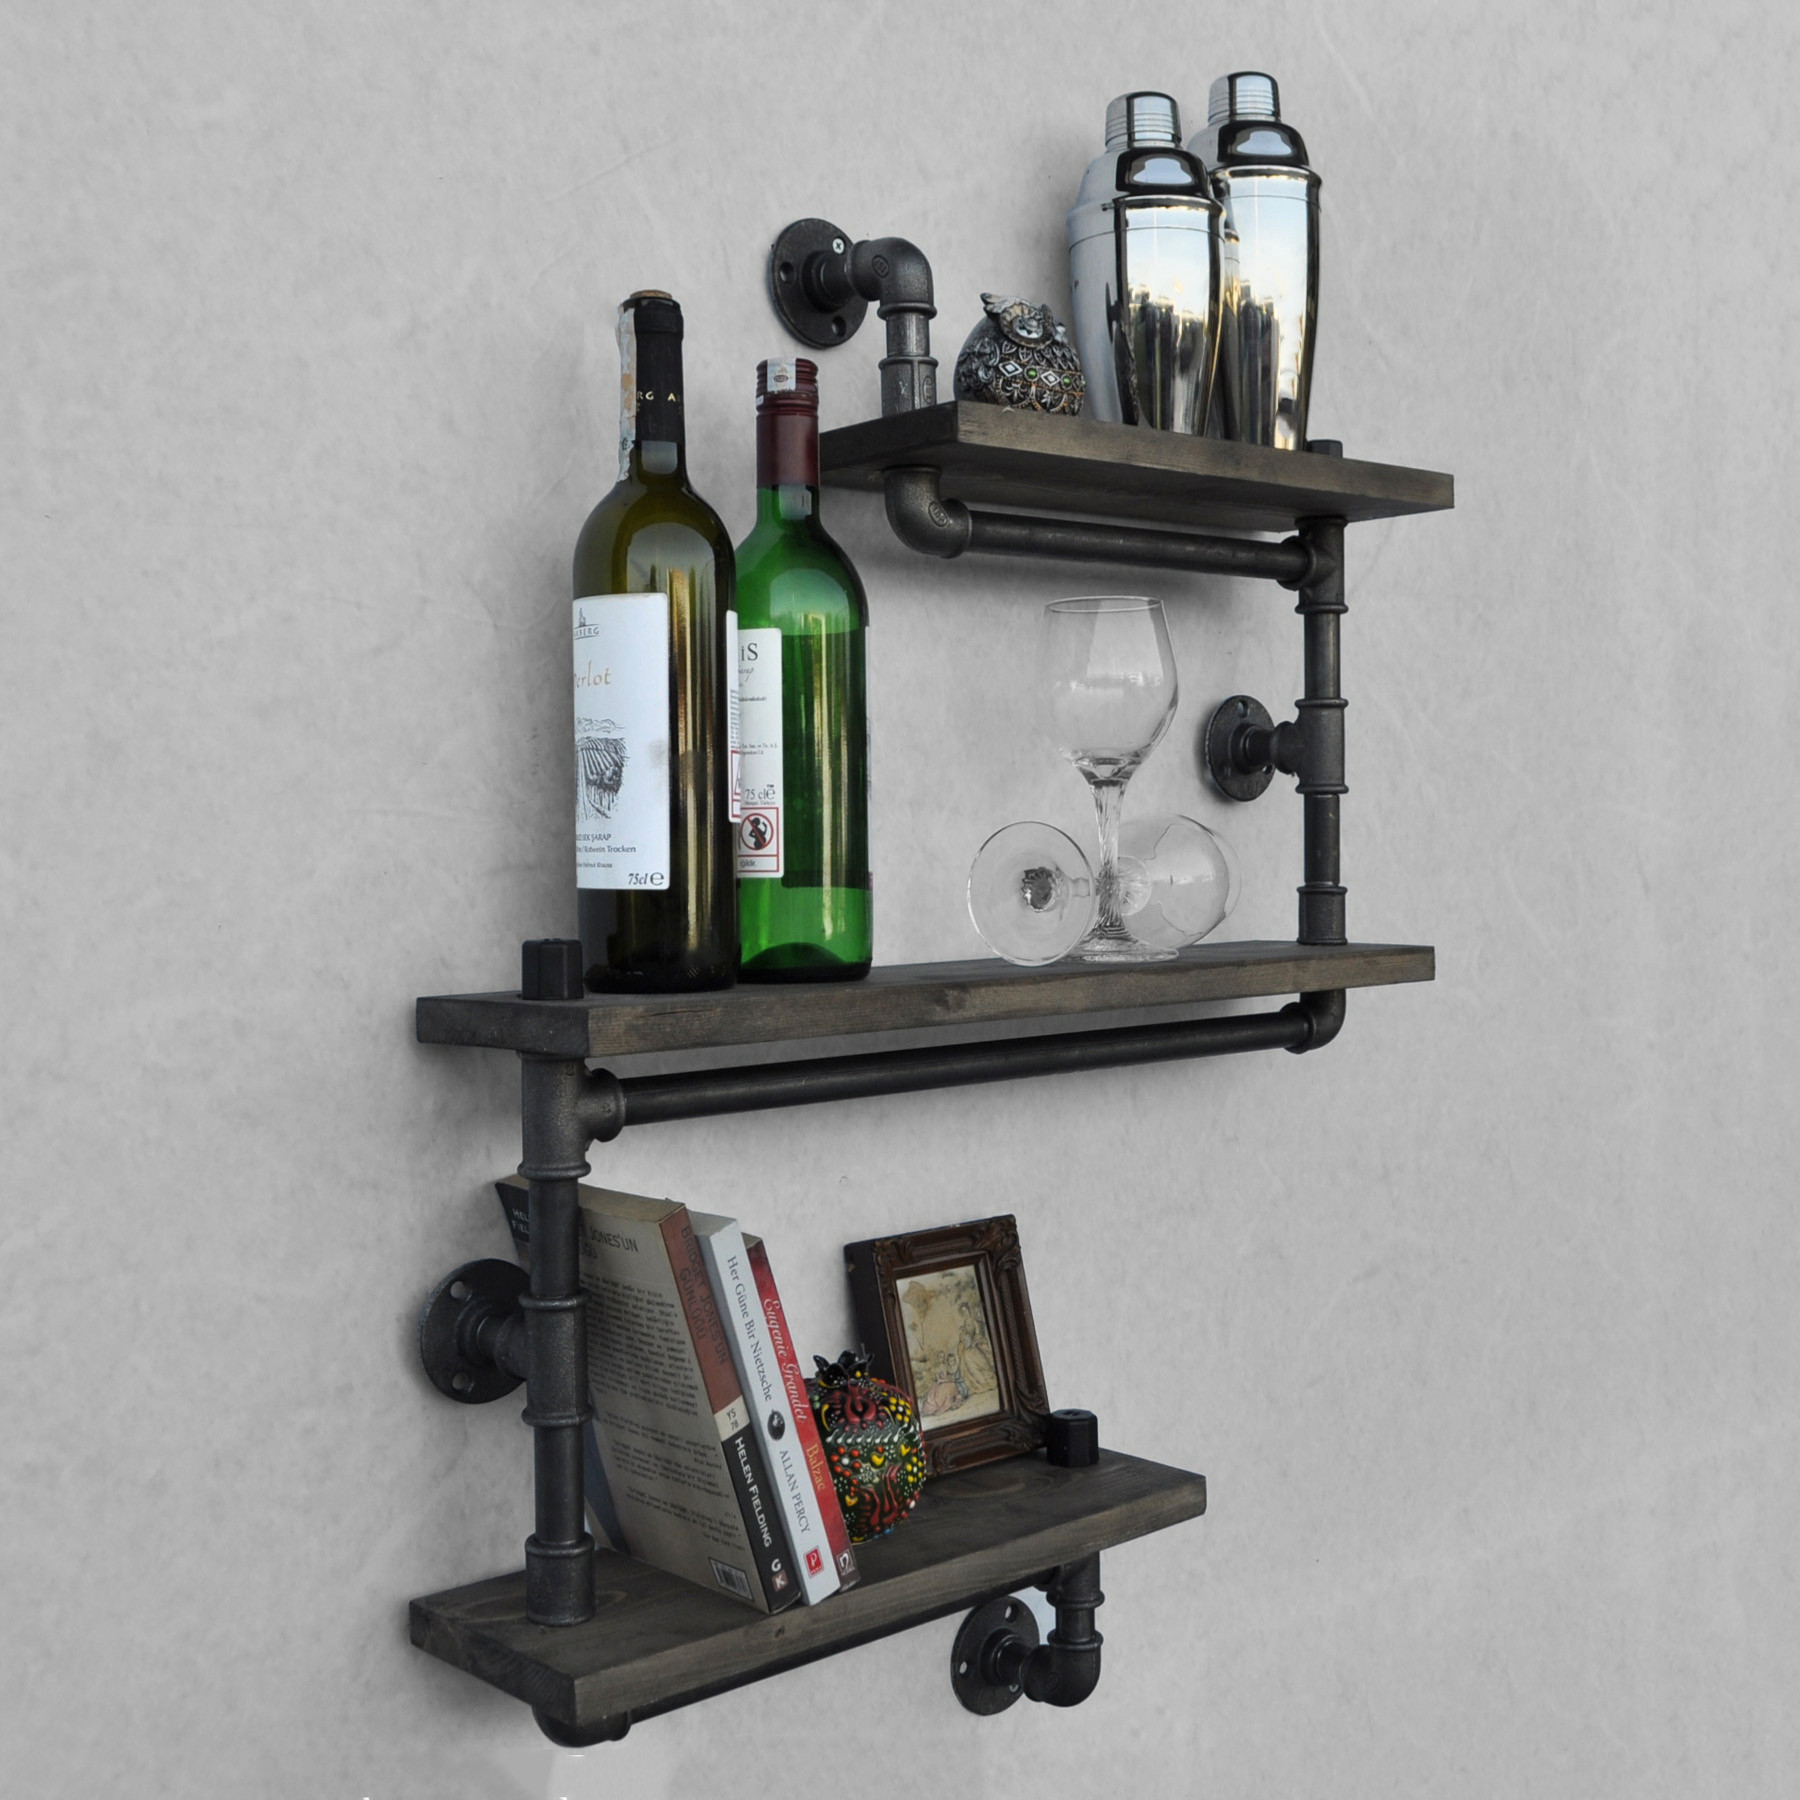 Pipe Shelf Boruraf 026 | Black